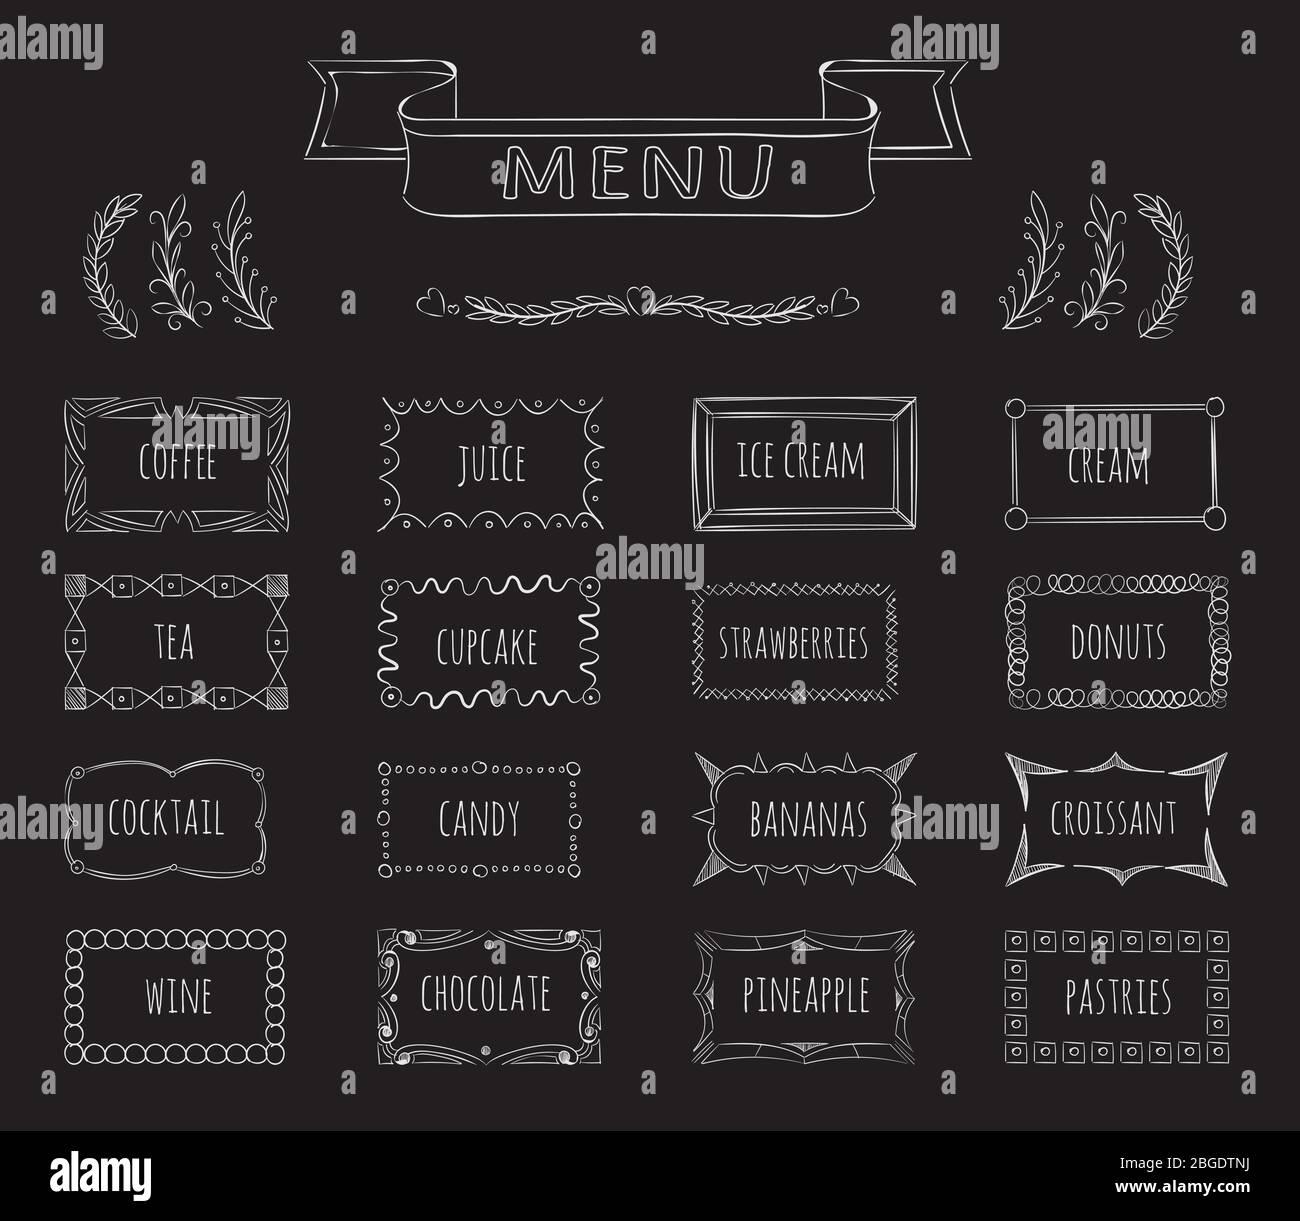 Cafe Blackboard Menu Hand Drawn Set Stock Vector Image Art Alamy